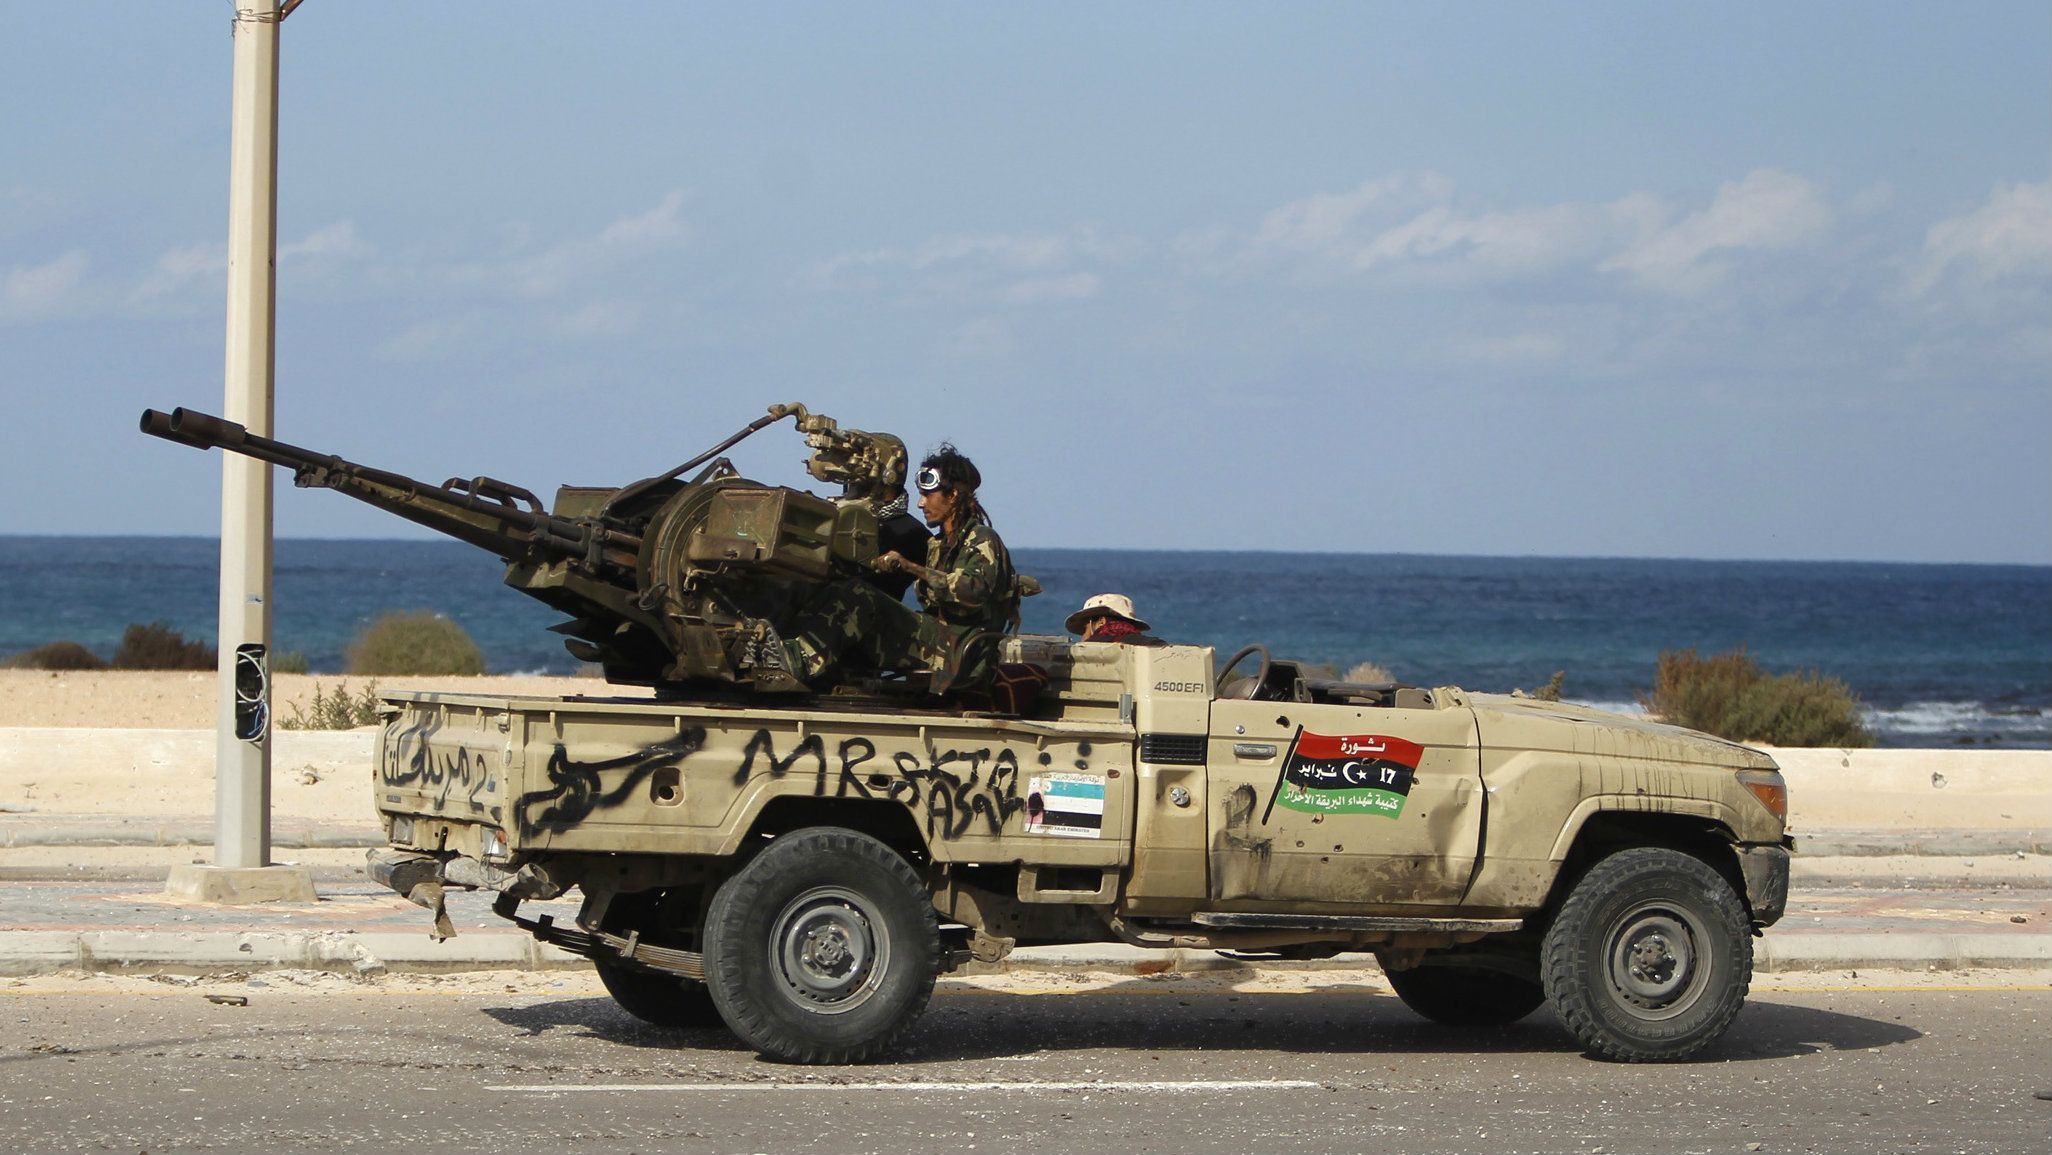 In Libya, You Can Buy Anti-Aircraft Gun on Facebook - MPC JOURNAL